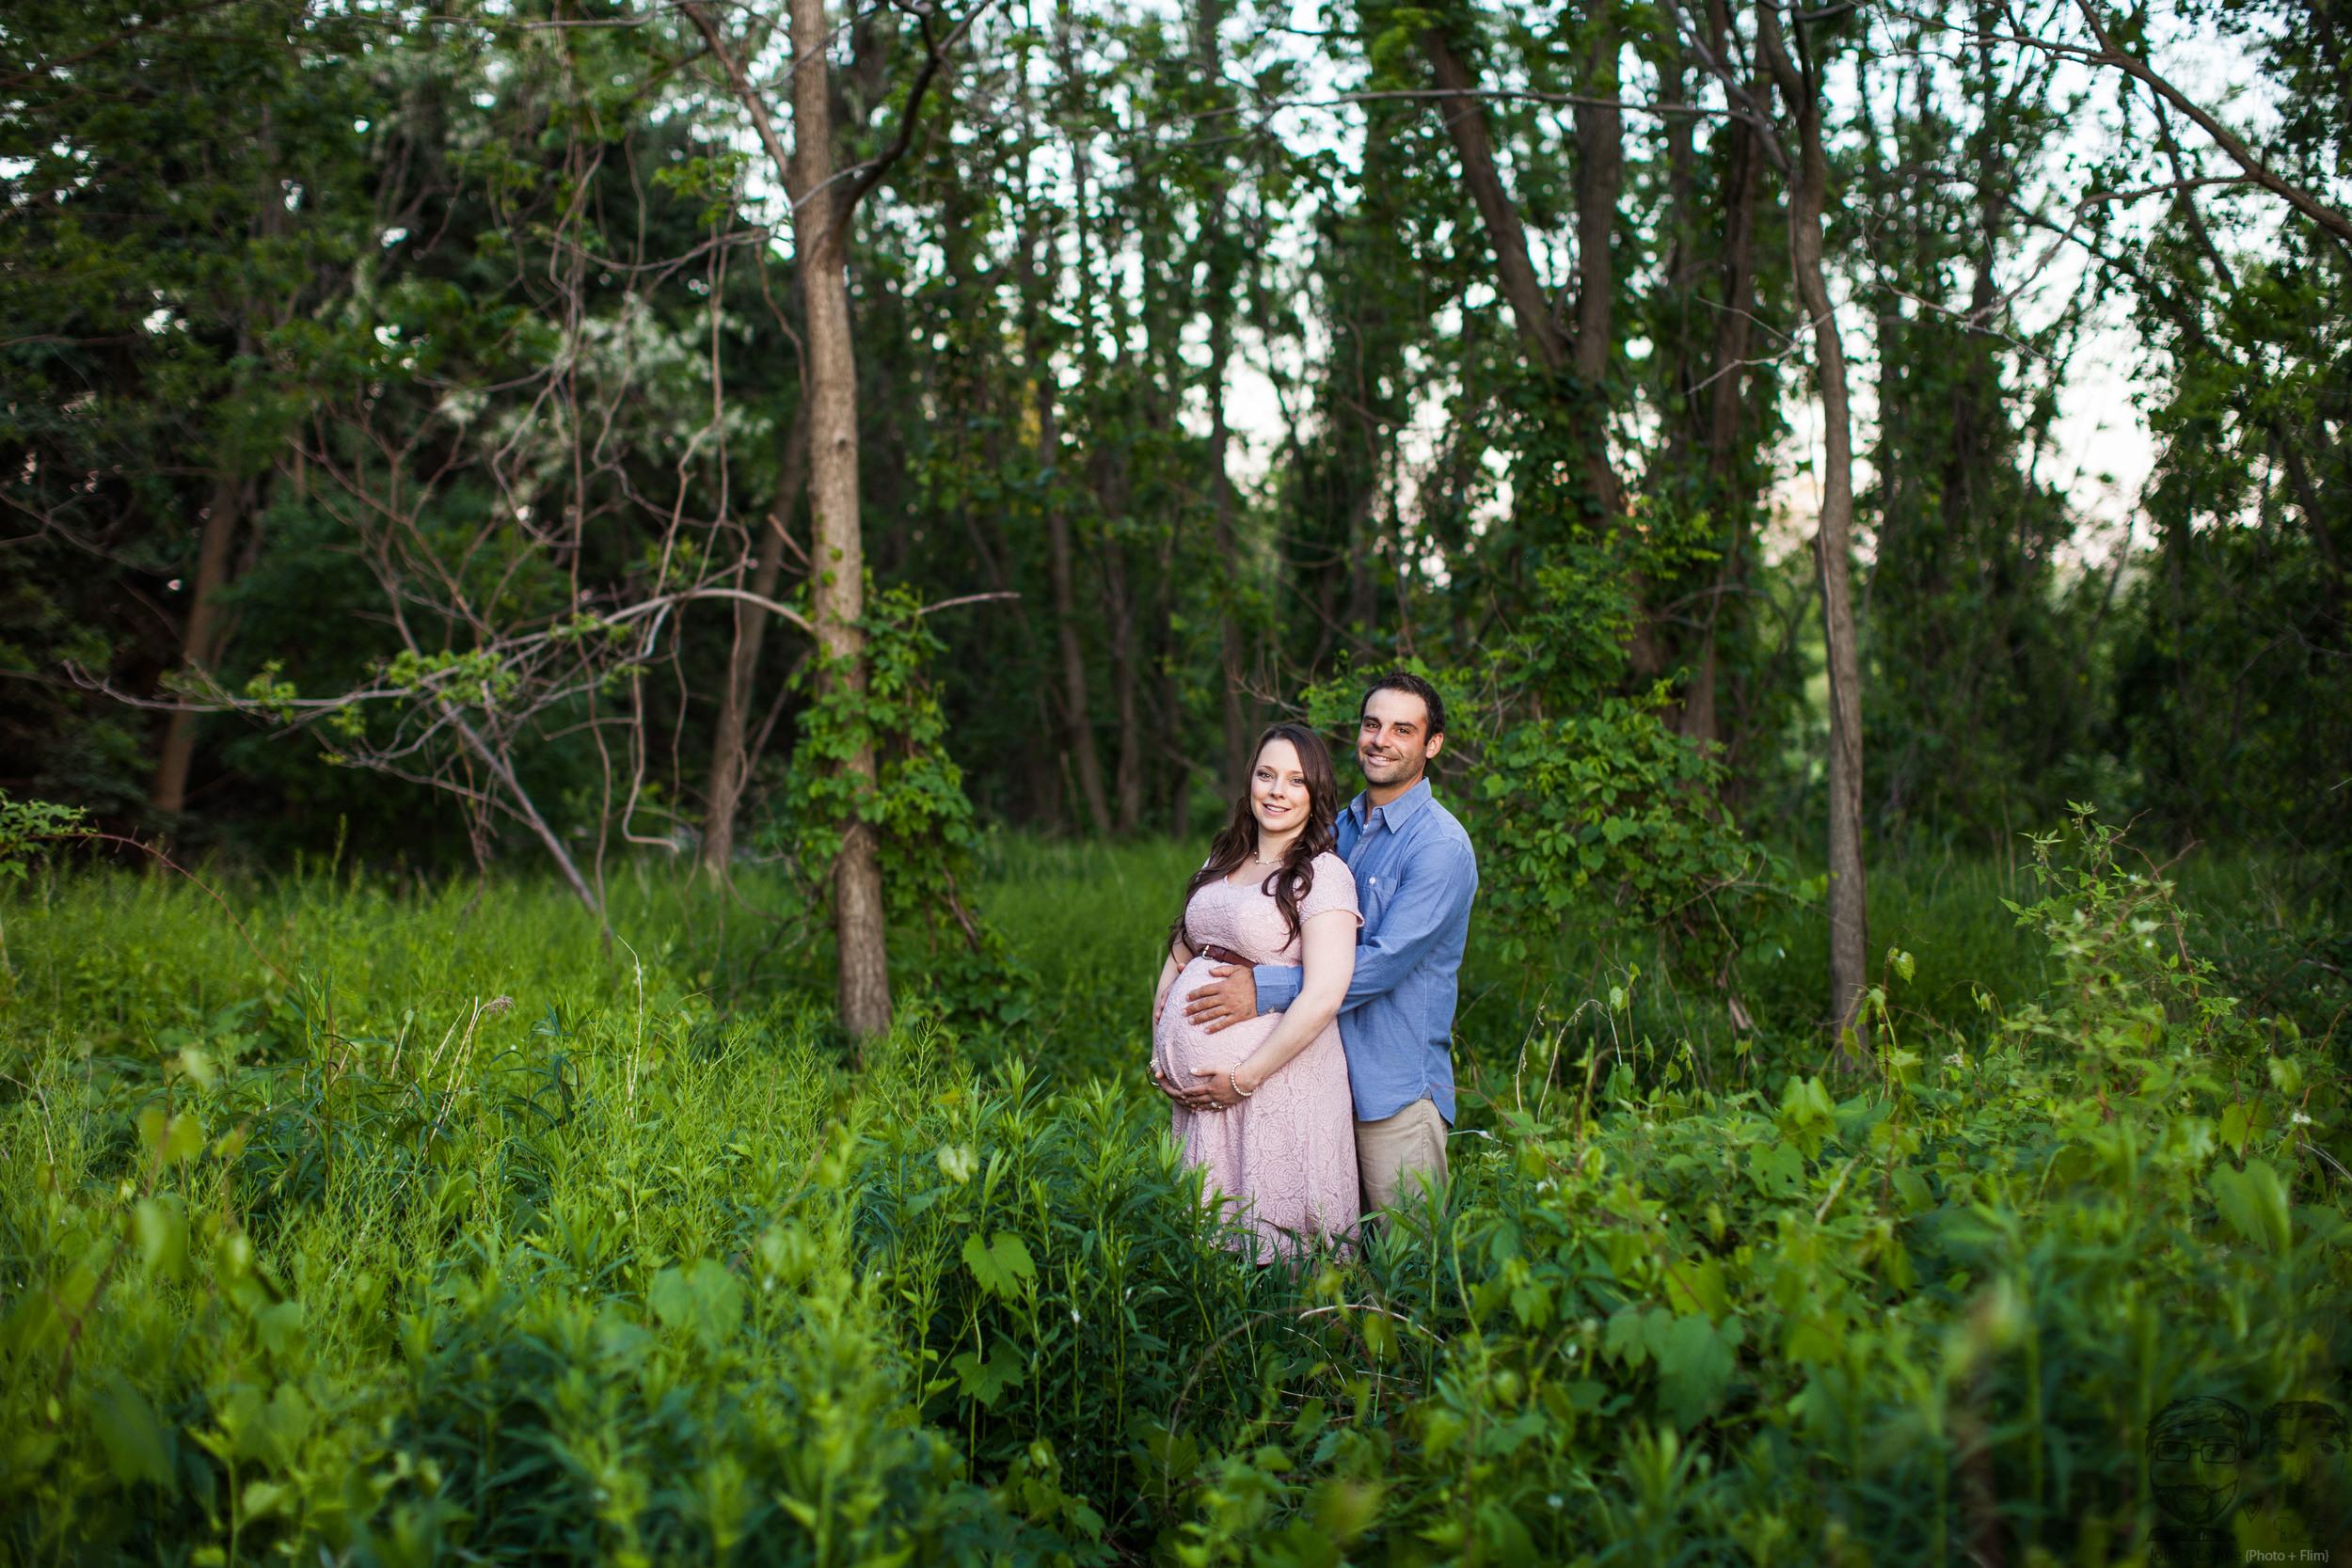 014Toronto photographers-Baby Bump-Jono & Laynie Co.jpg